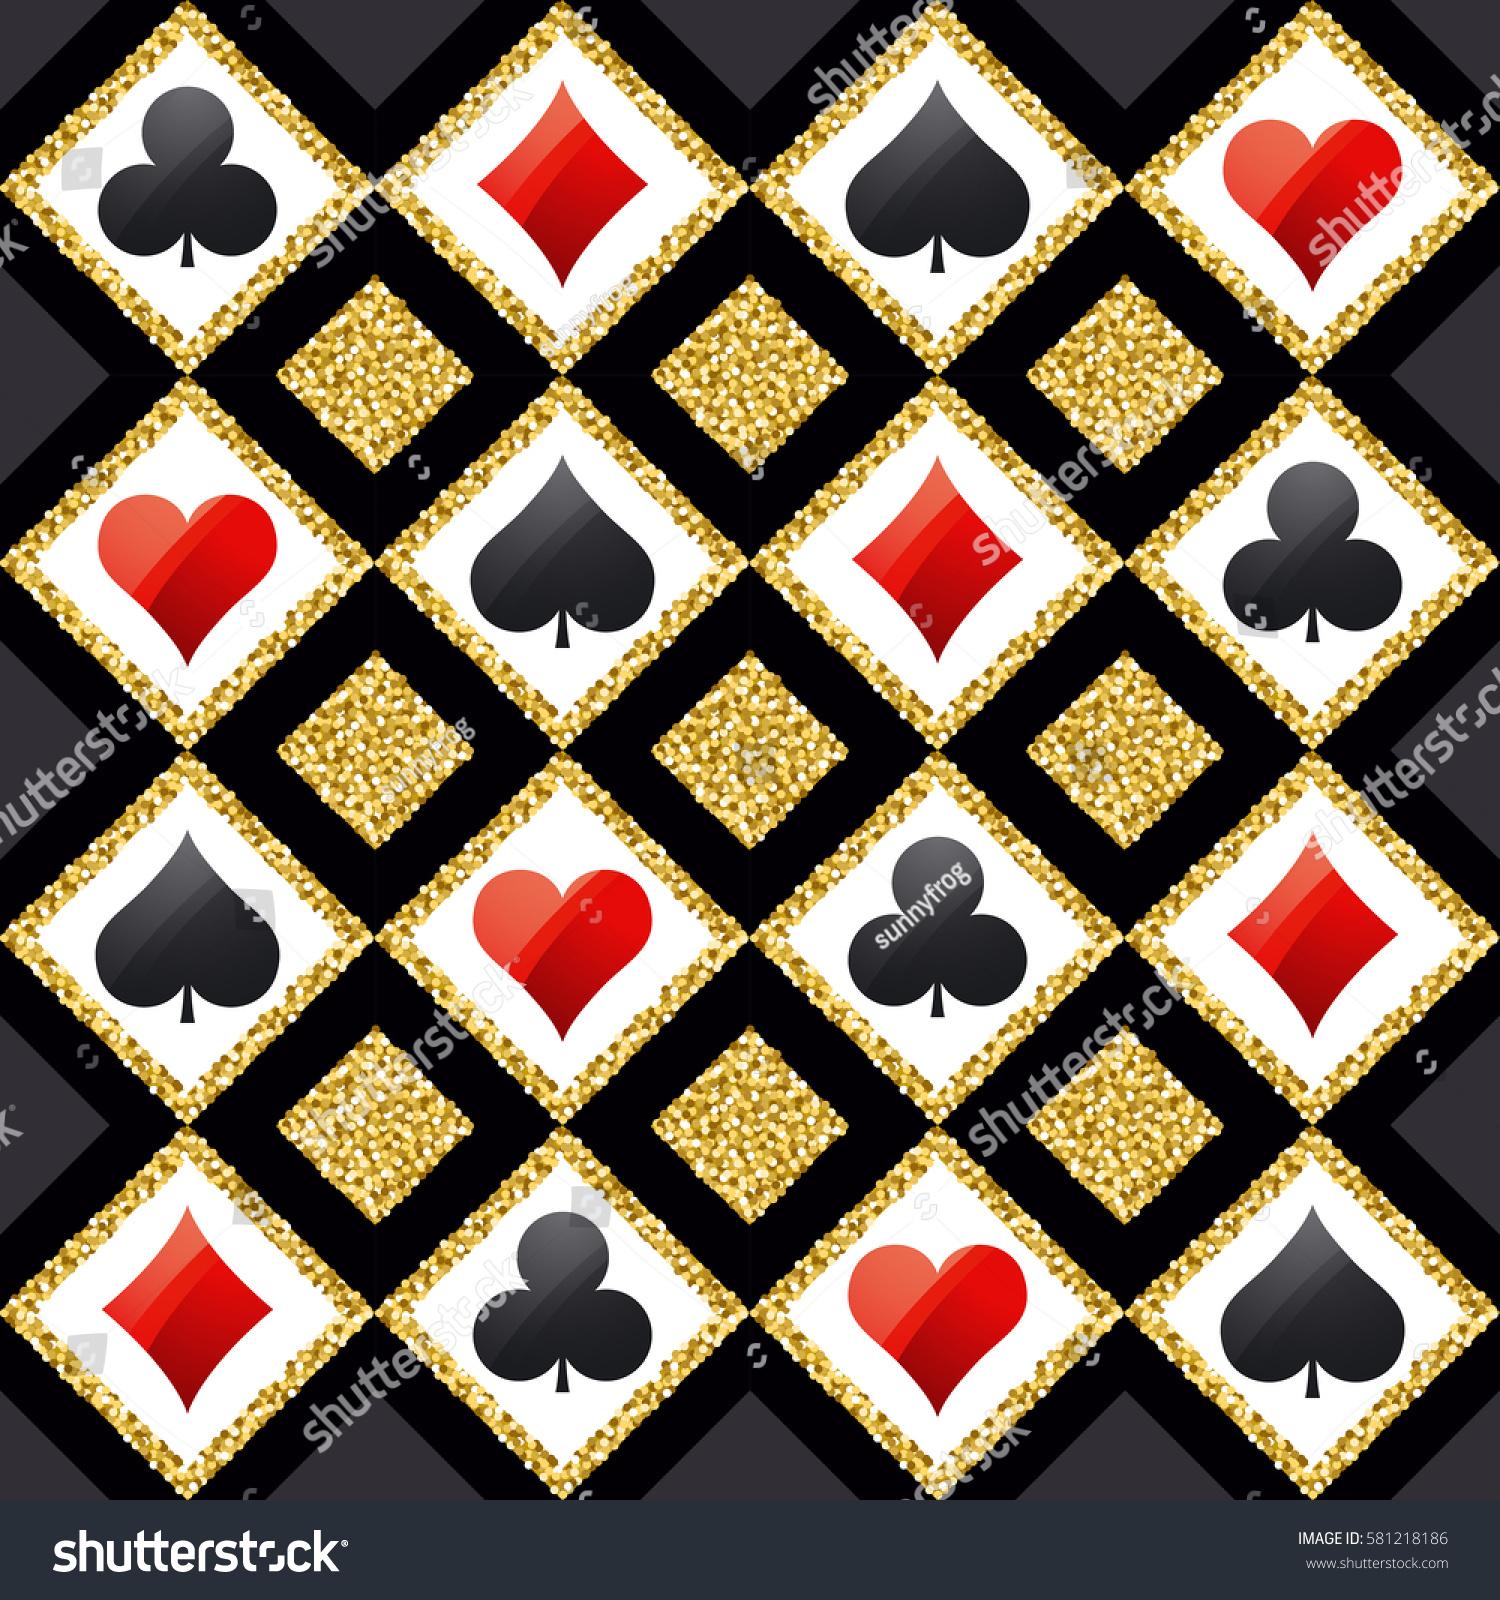 Casino gambling poker black jobs in casino